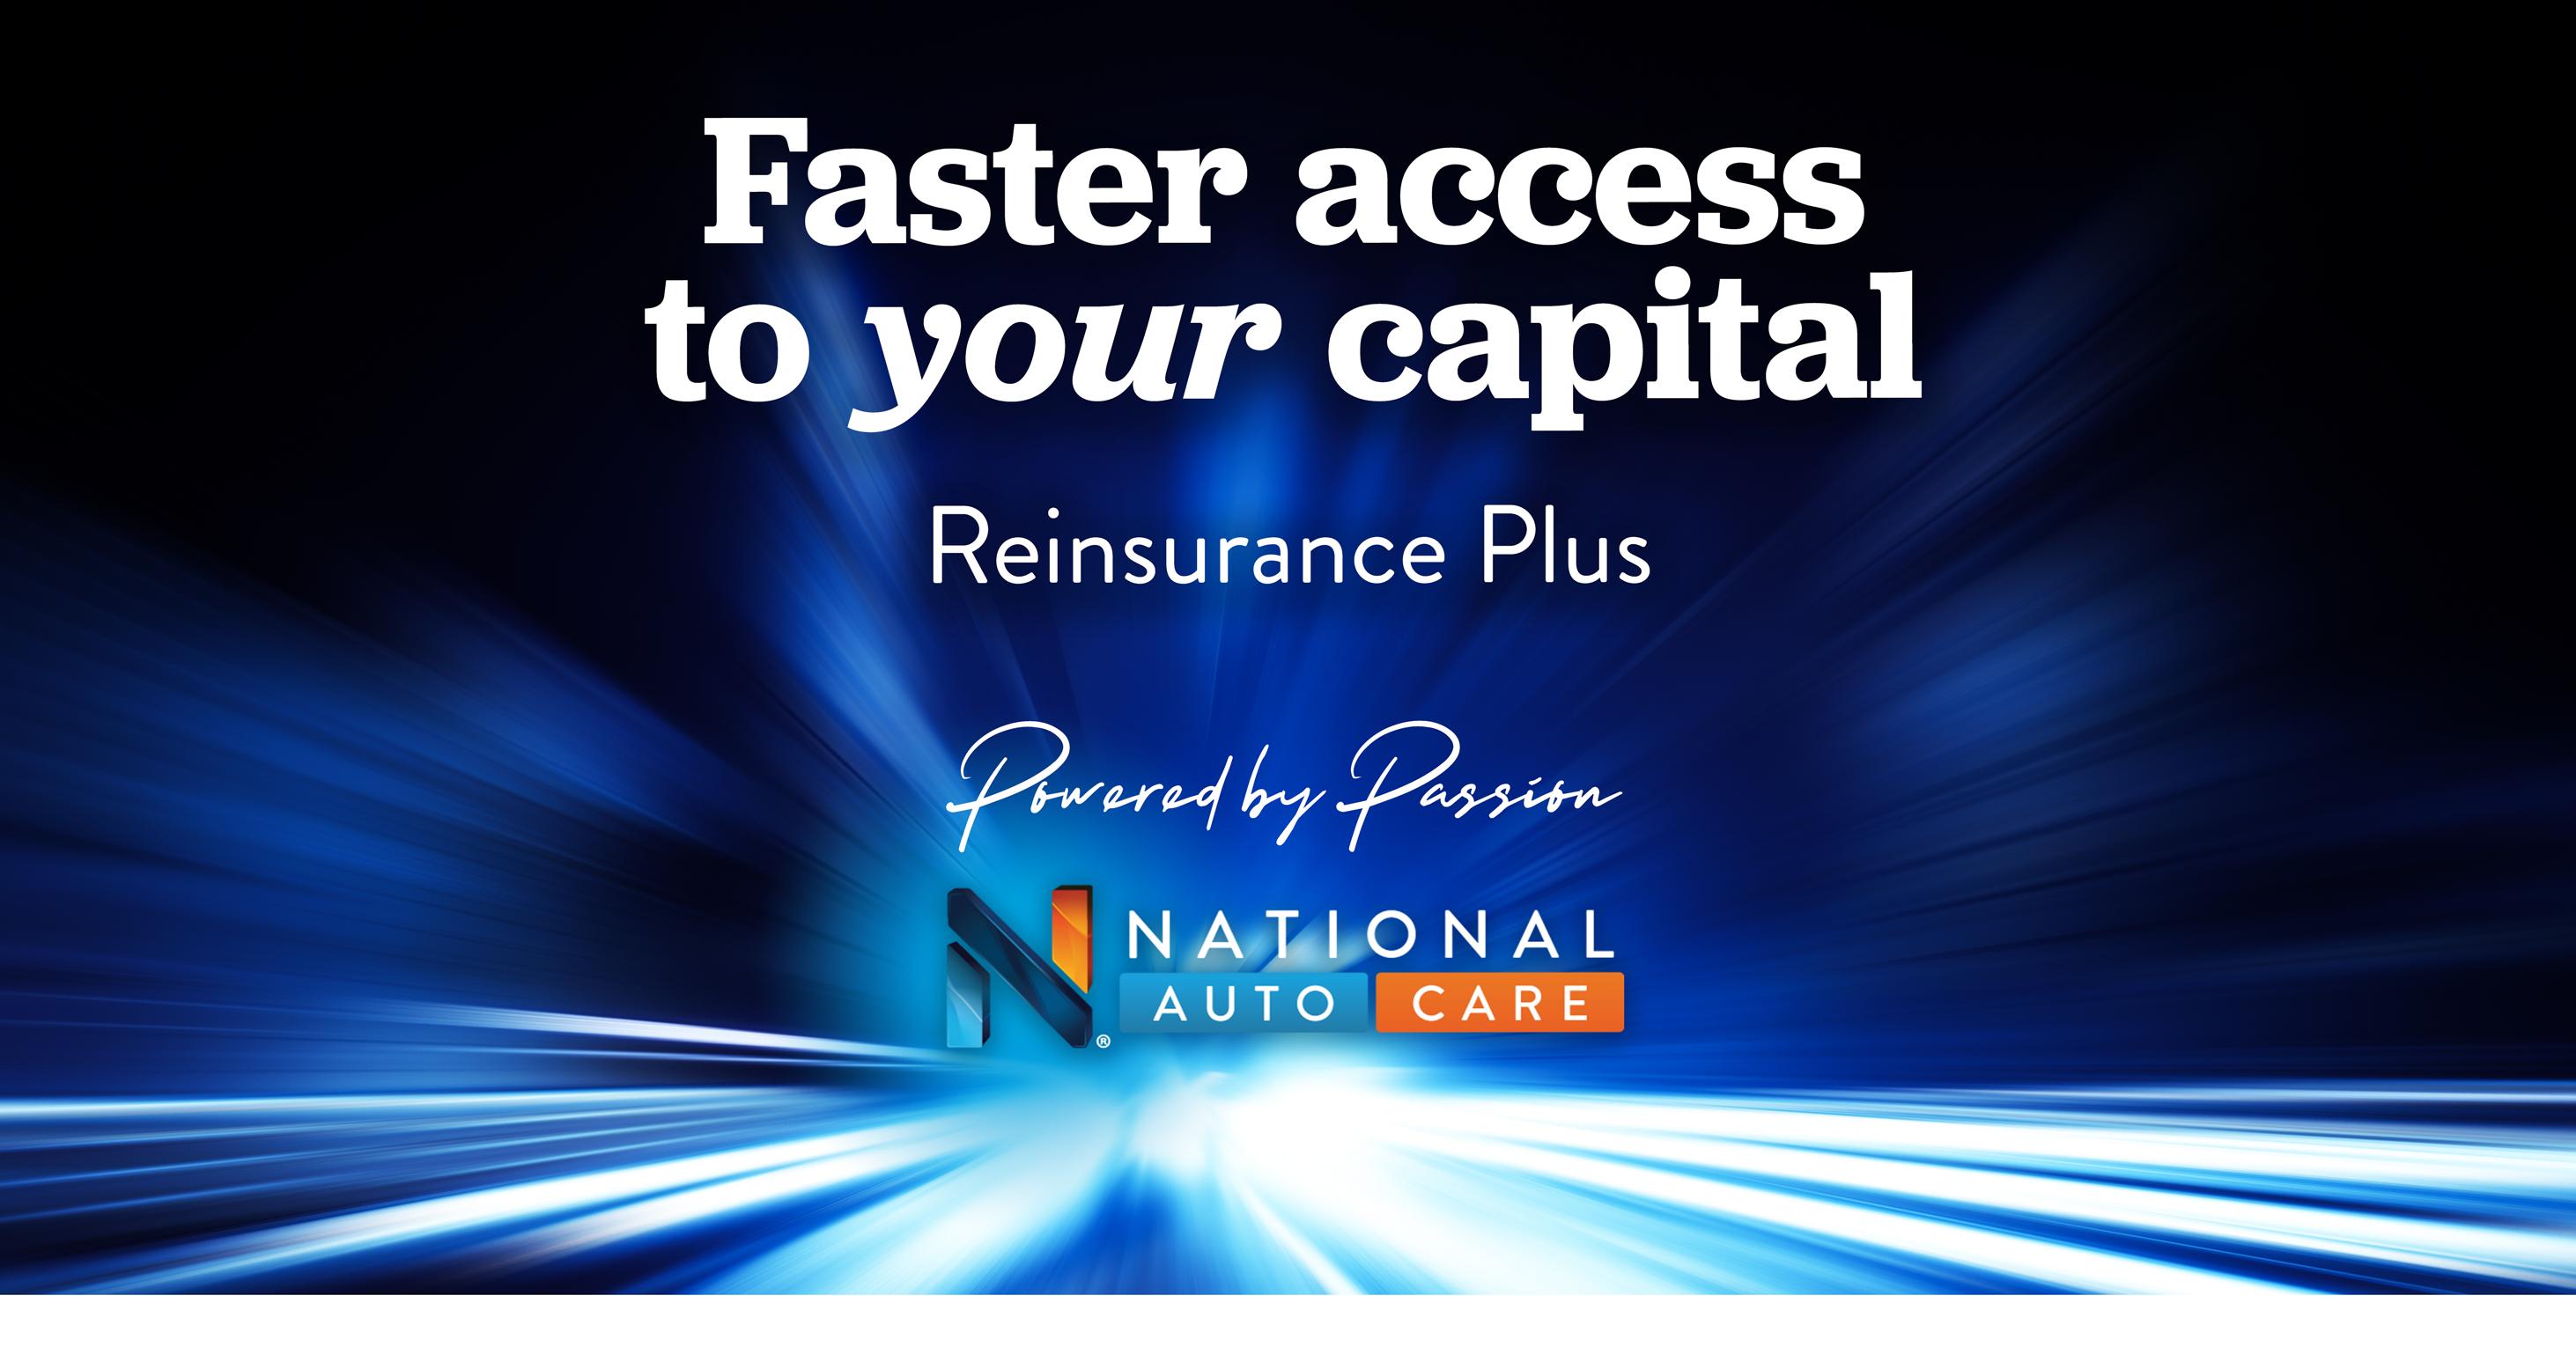 National Auto Care launches Reinsurance Plus